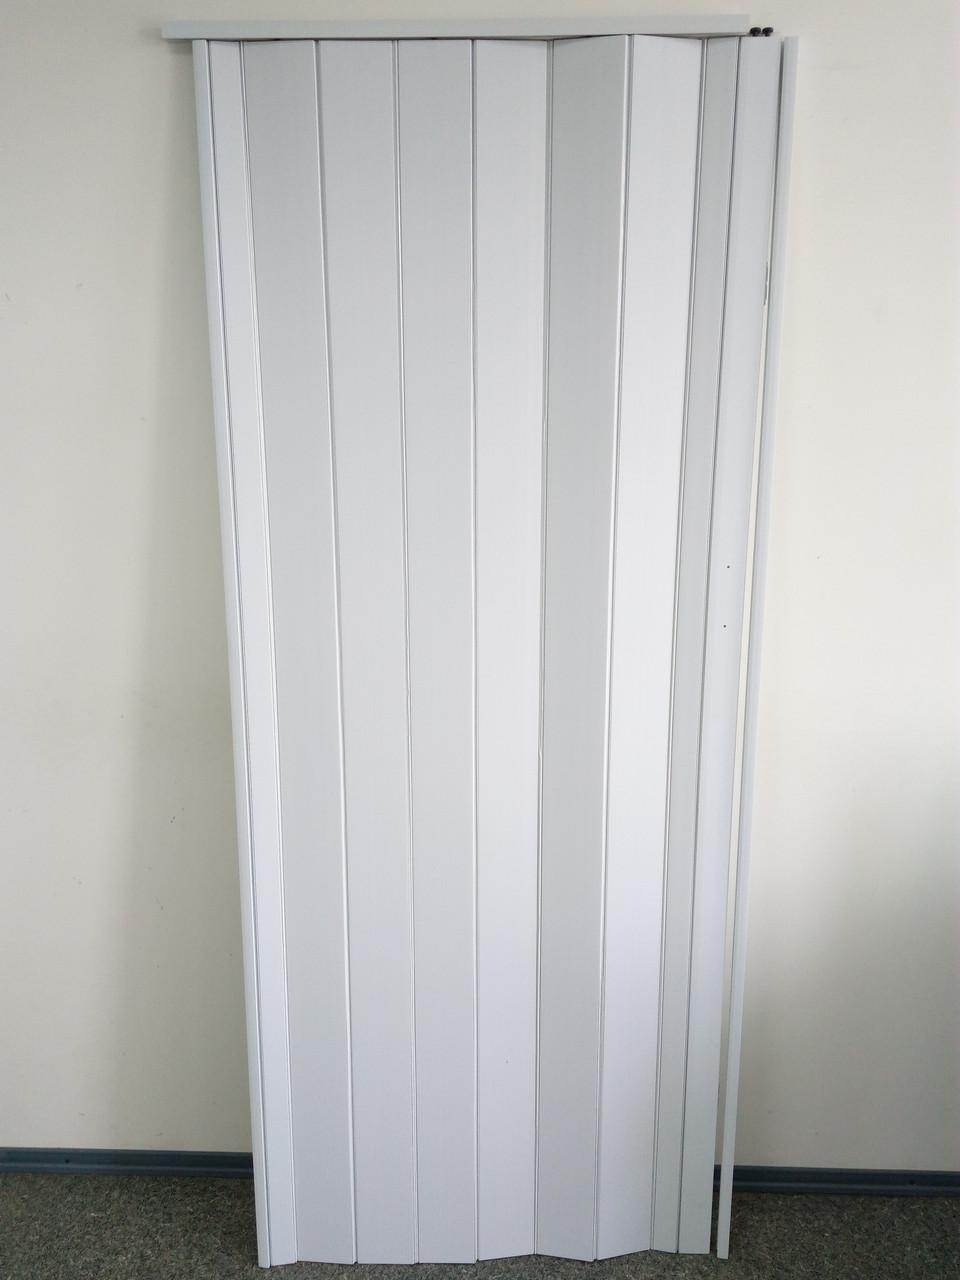 Дверь белая гармошка глухая 822, 810*2030*6 мм